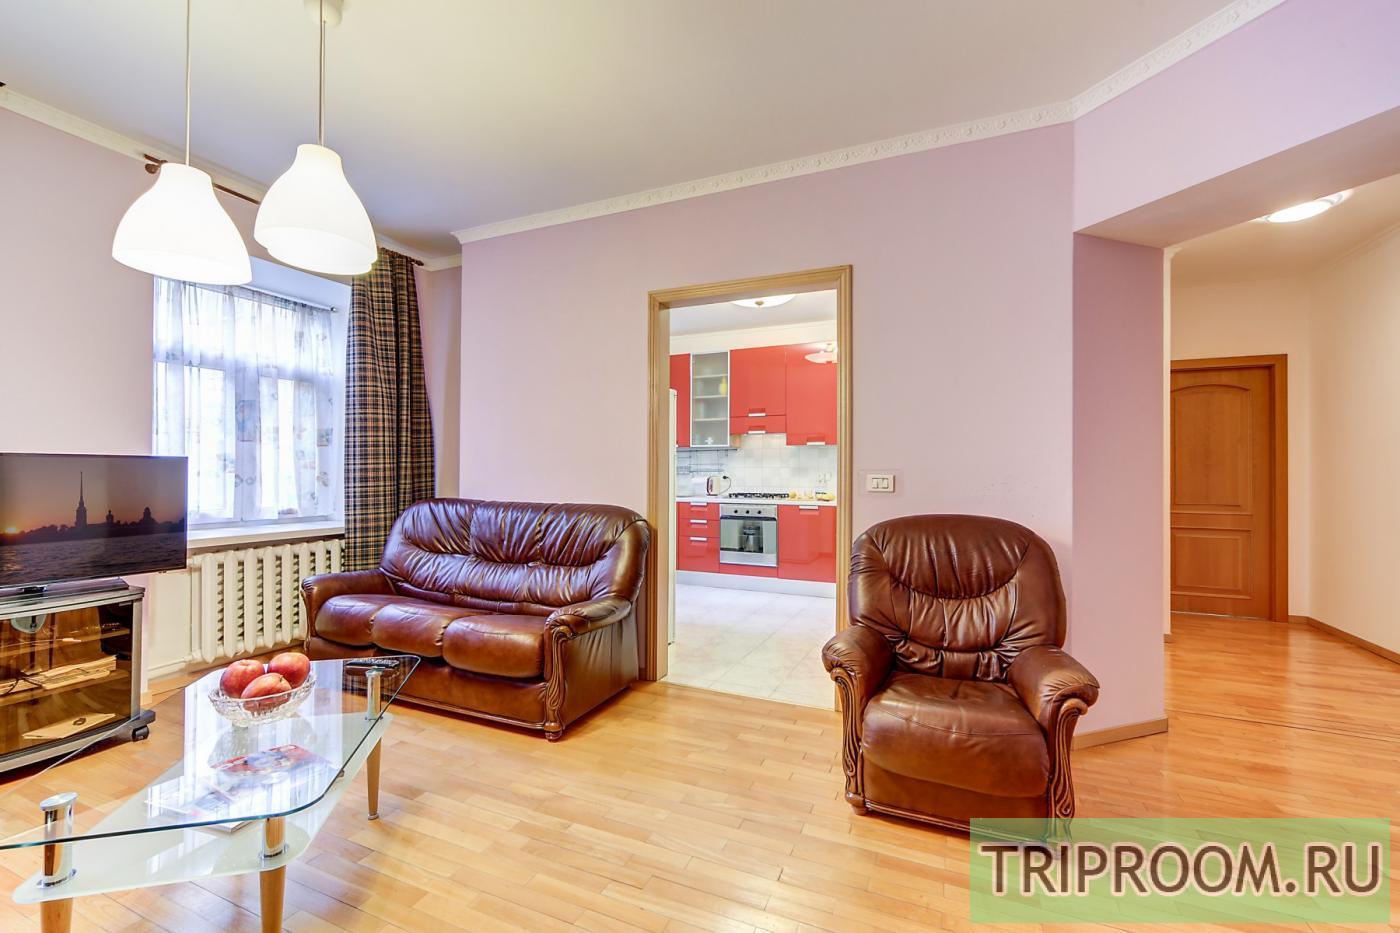 2-комнатная квартира посуточно (вариант № 20143), ул. Невский проспект, фото № 3